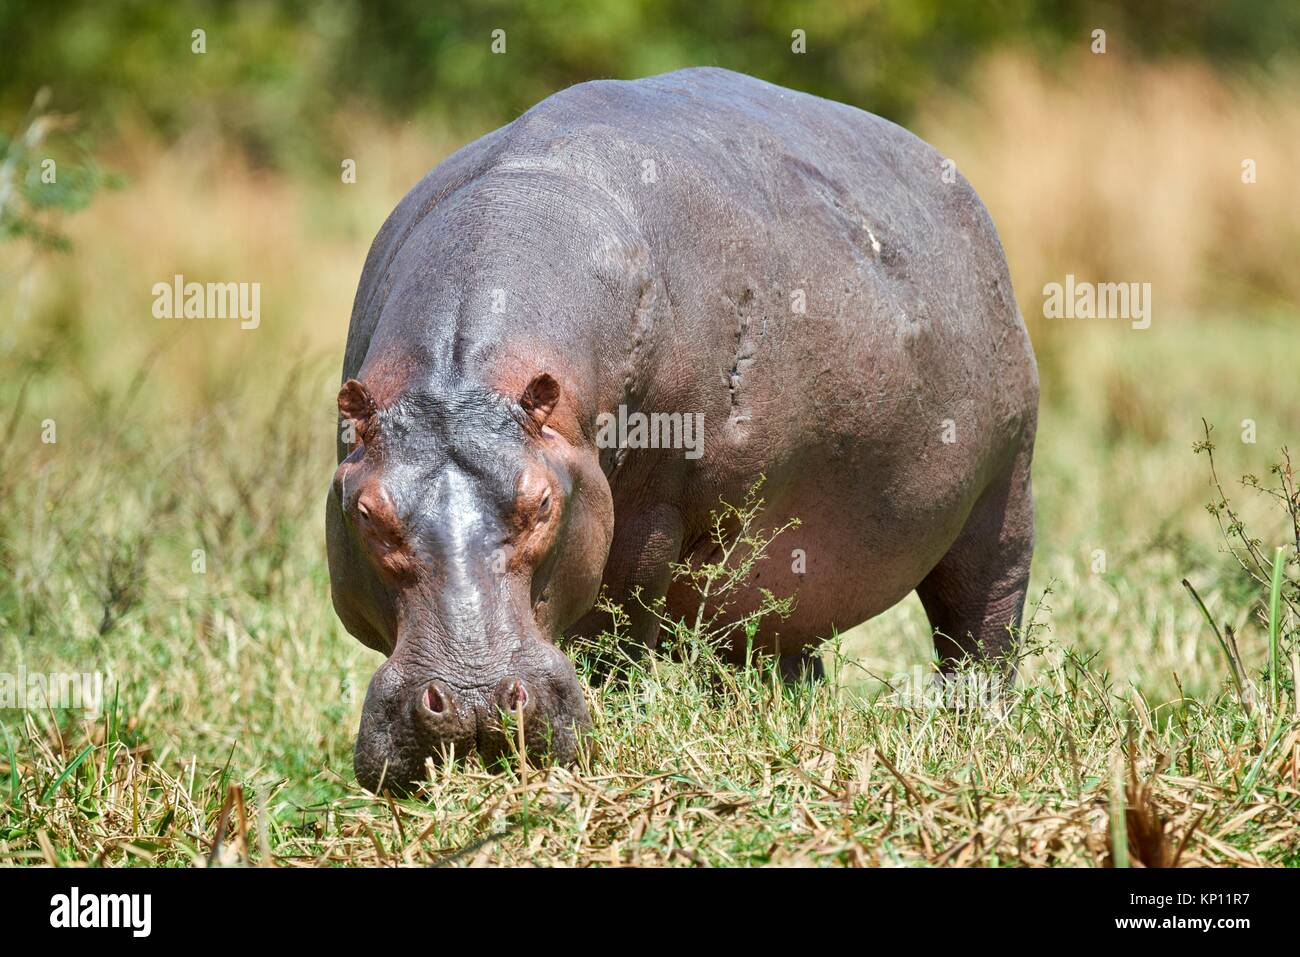 Hippopotamus grazing (Hippopotamus amphibius) Murchisson Falls National Park, Uganda. - Stock Image